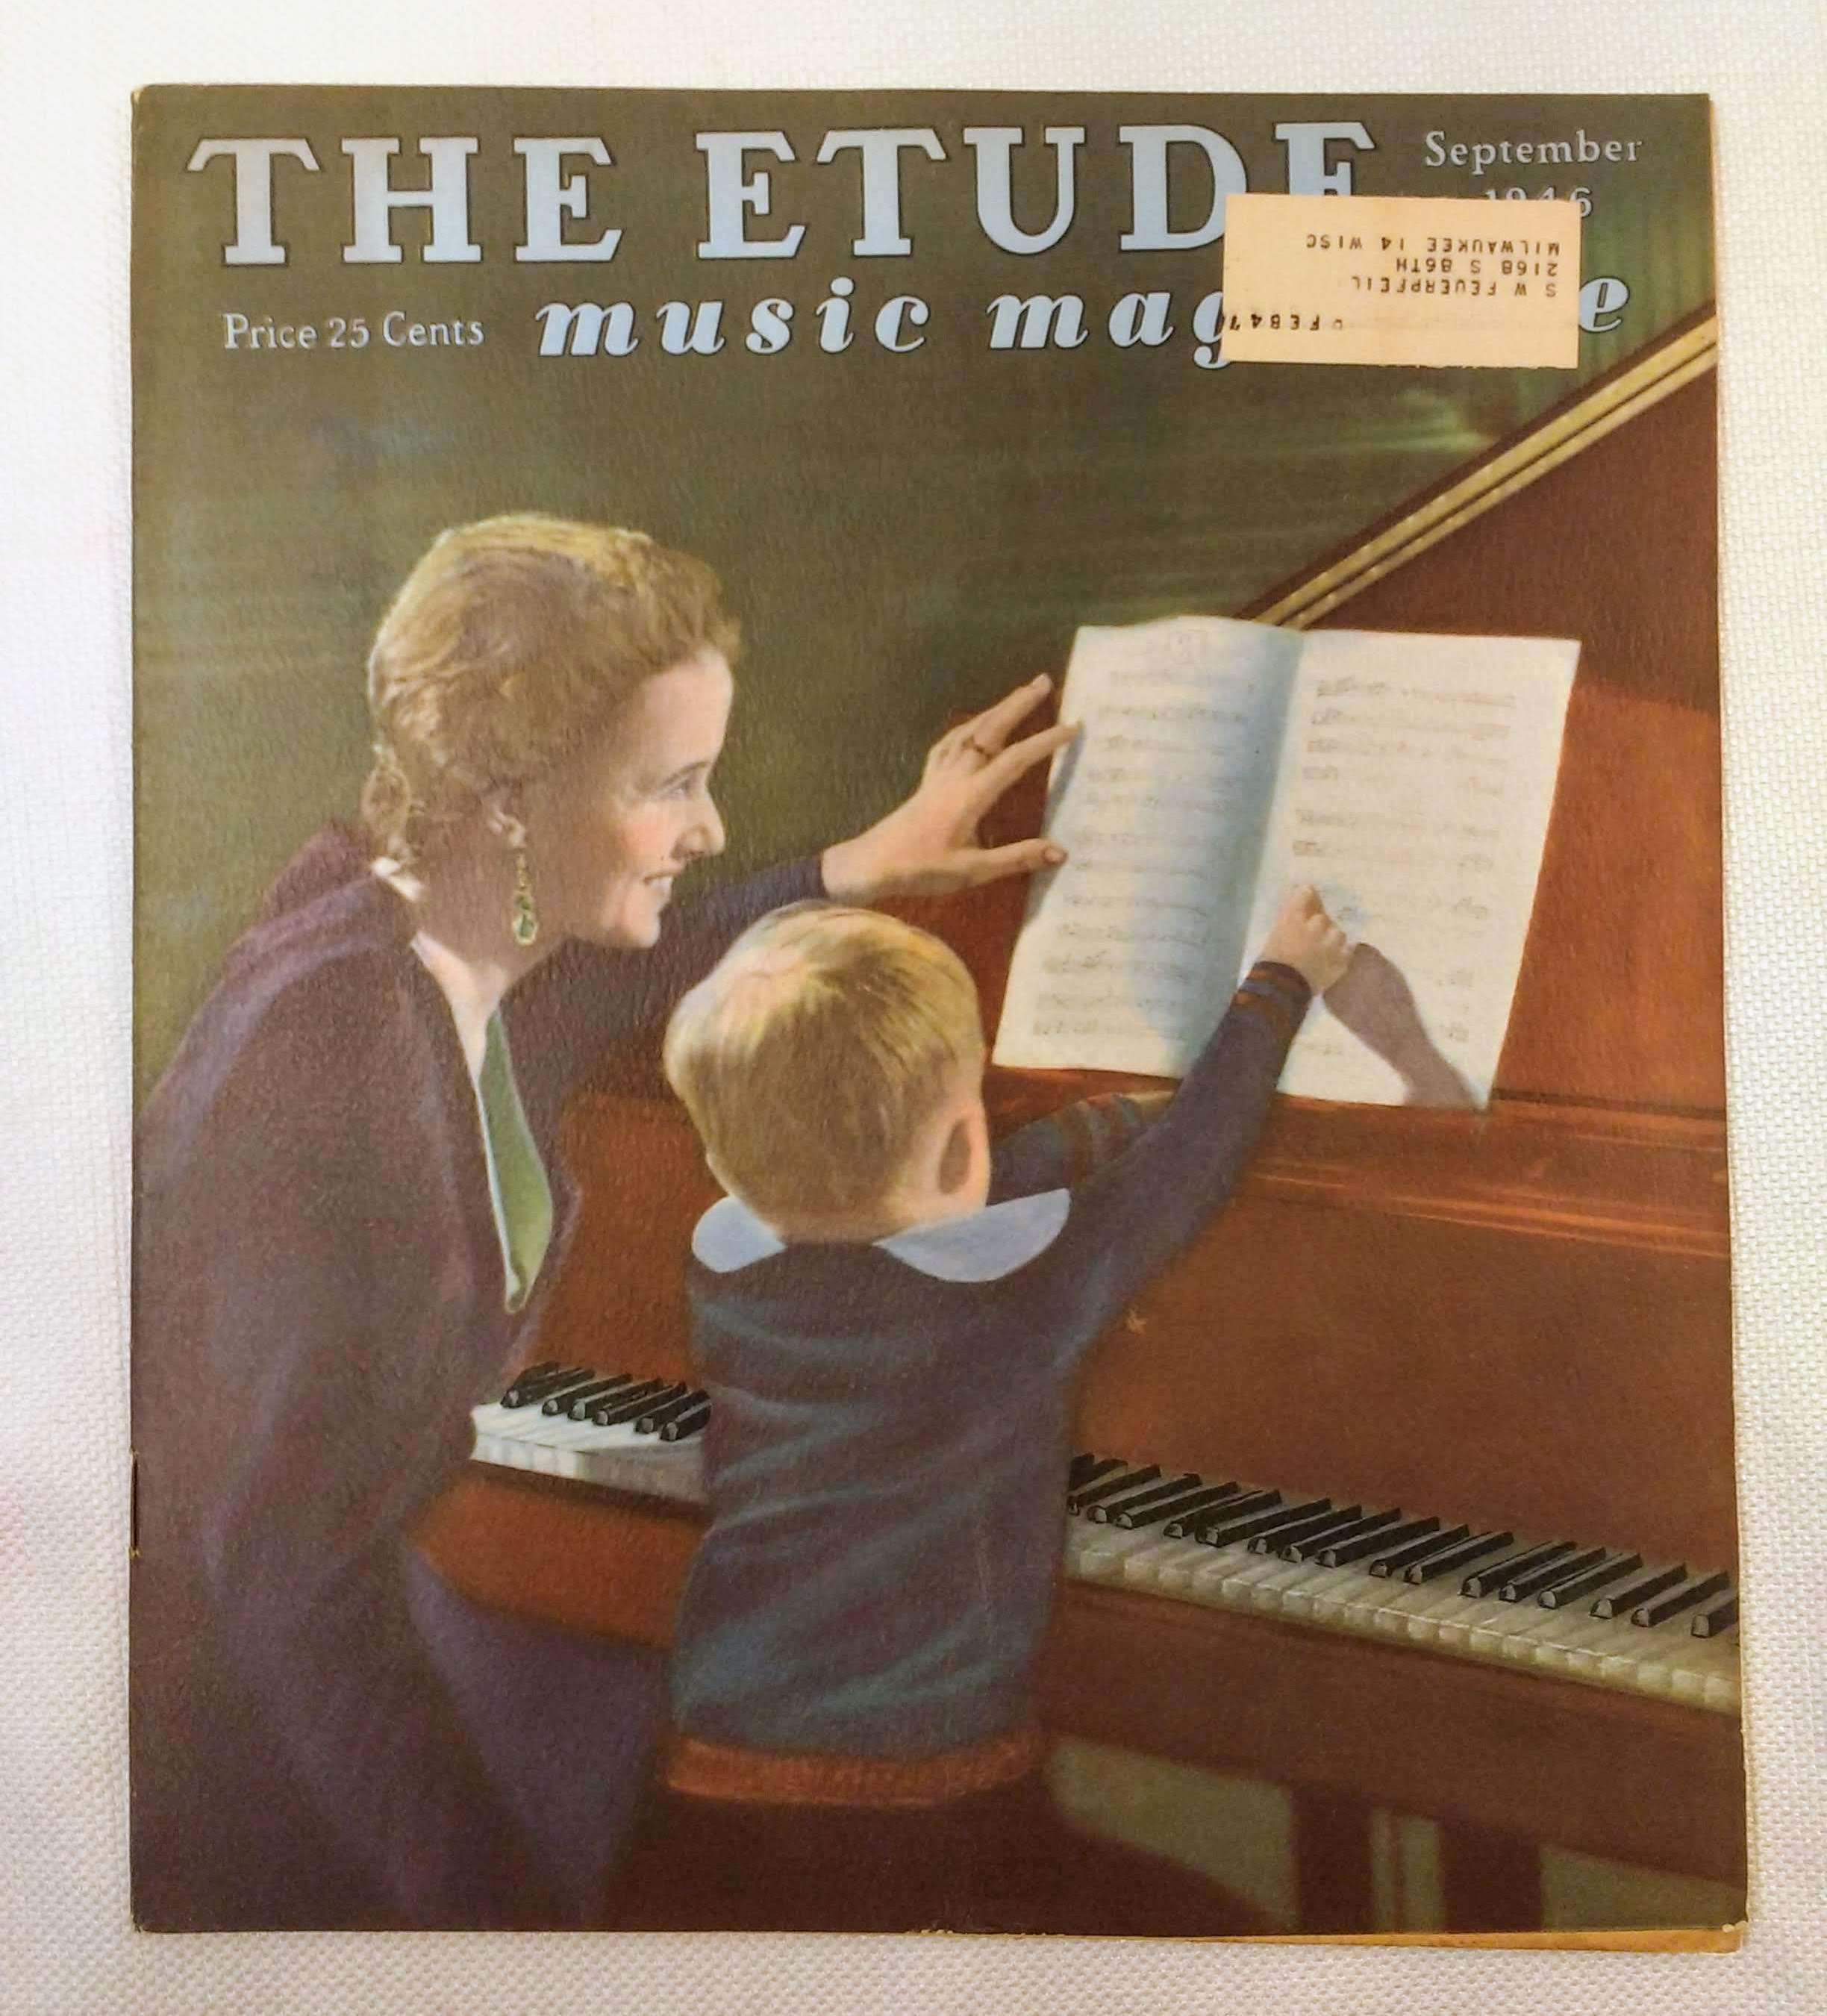 The Etude Music Magazine: Volume LXIV, No. 9; September, 1946, Cooke, James Francis [ed.]